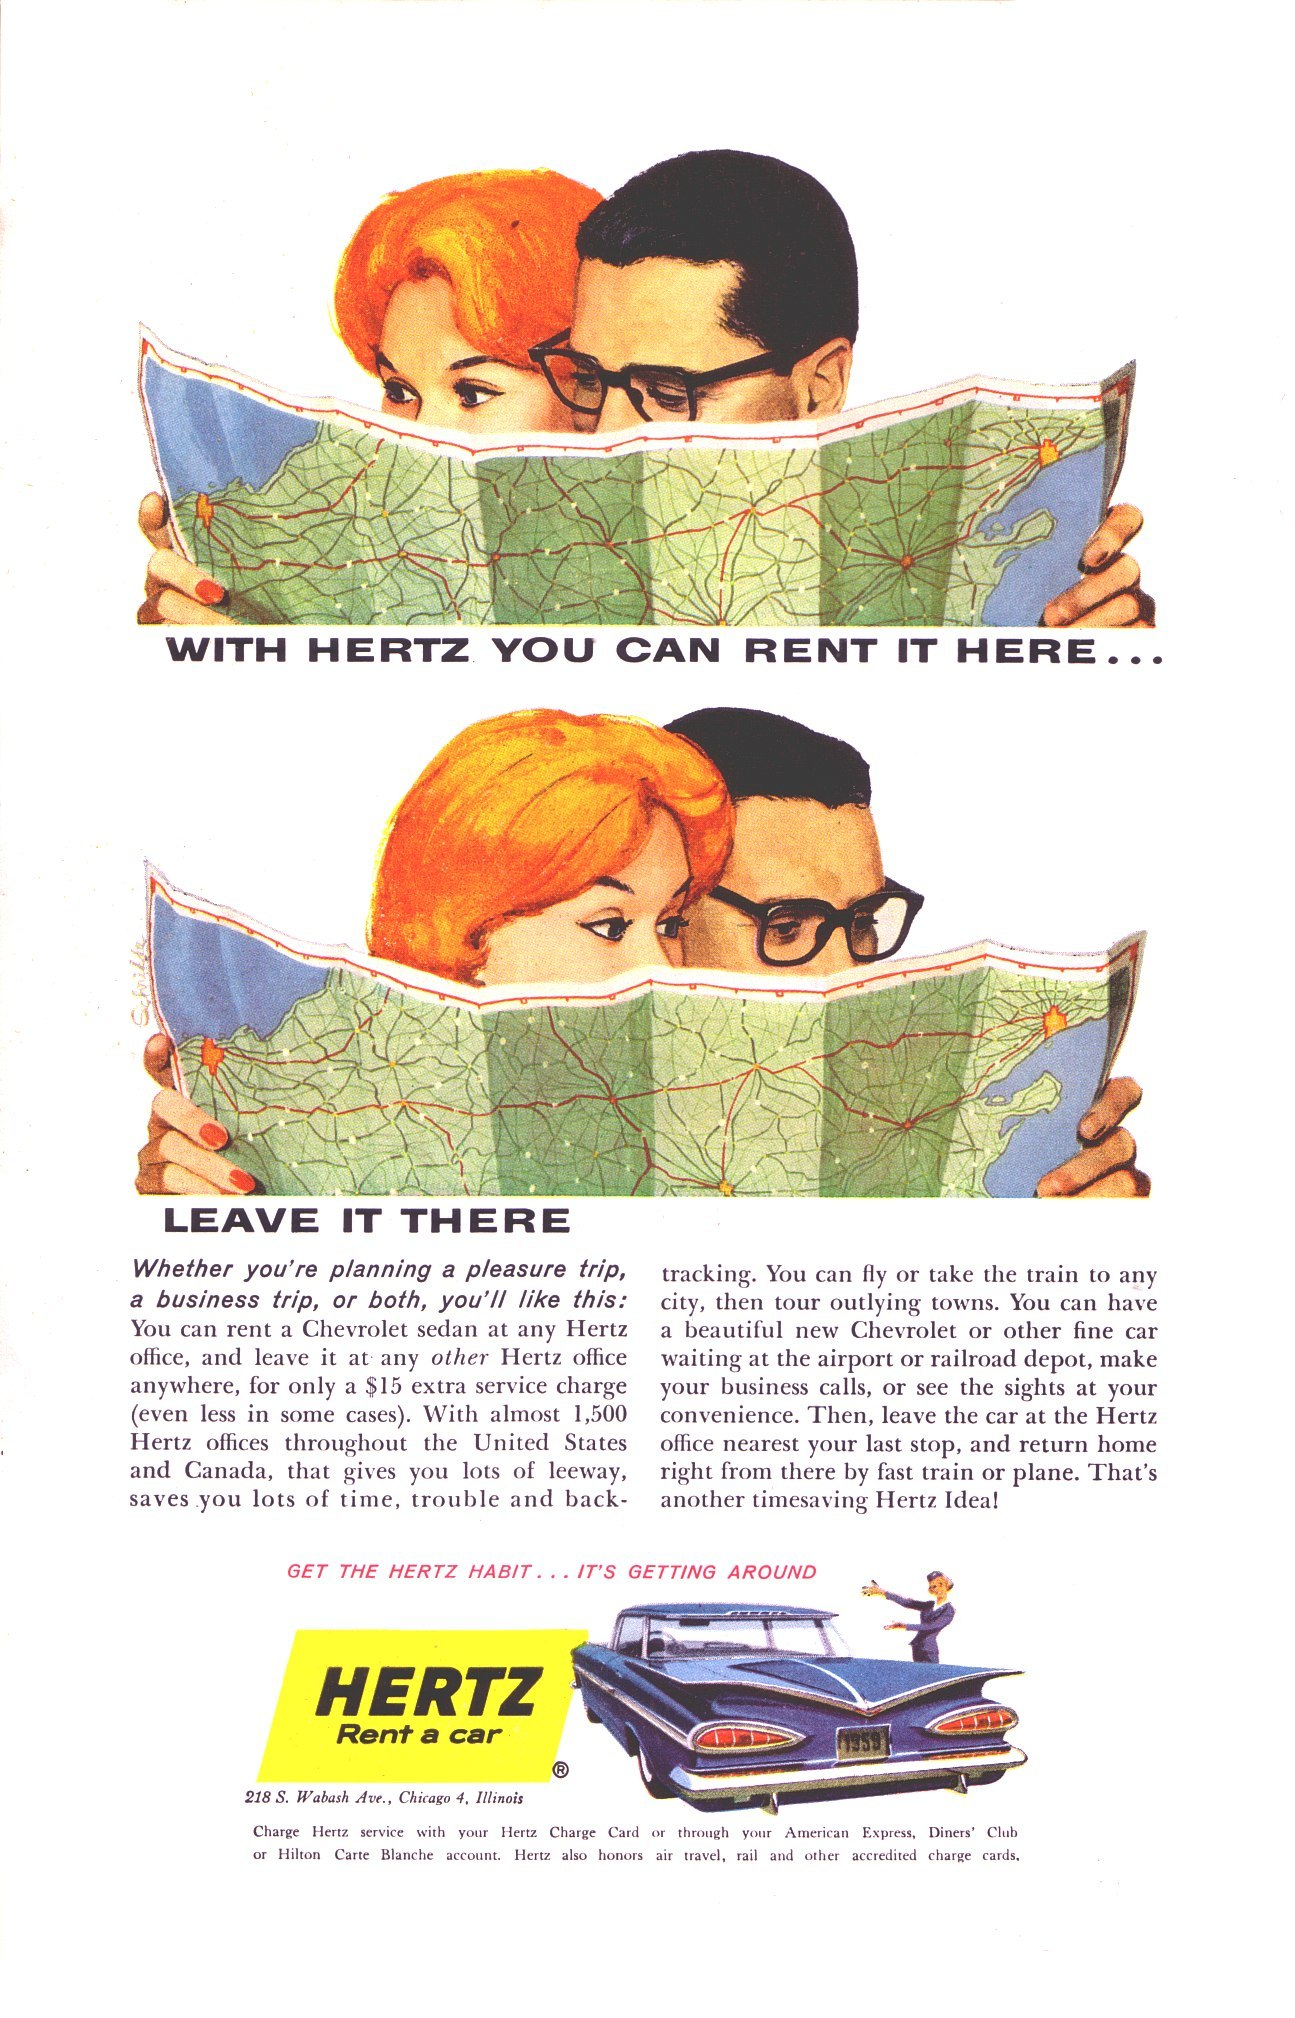 Hertz Rent a Car - 1959